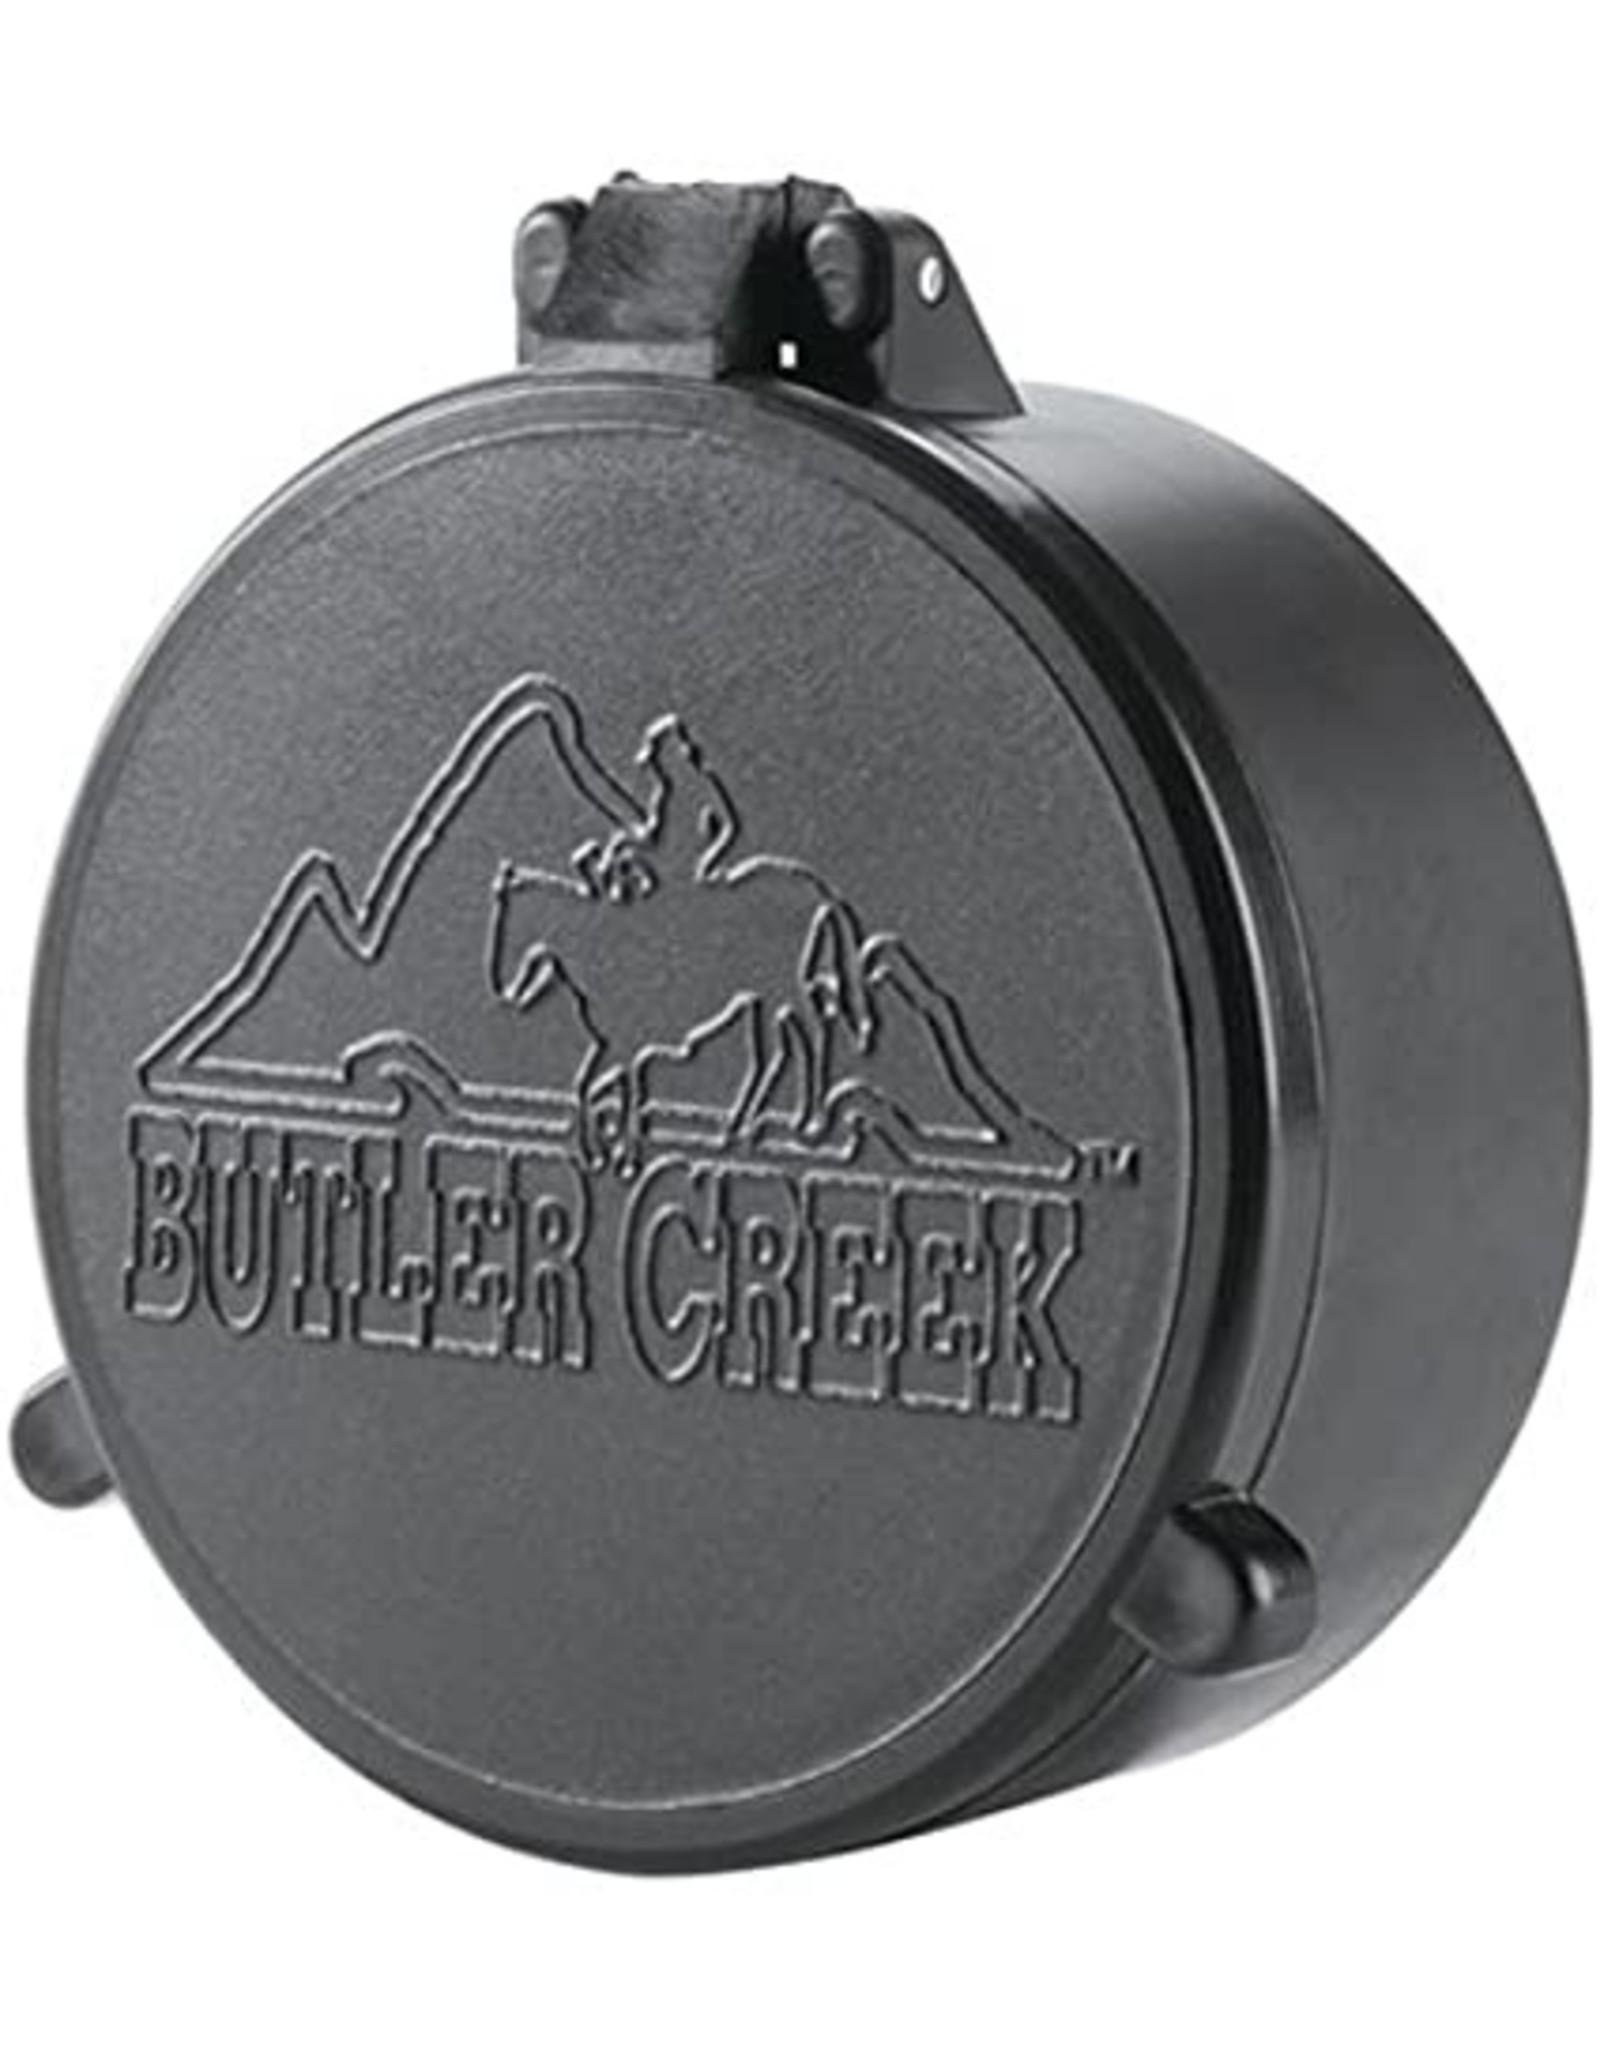 Butler Creek Butler Creek 15 Eye Flip Open Scope Cover